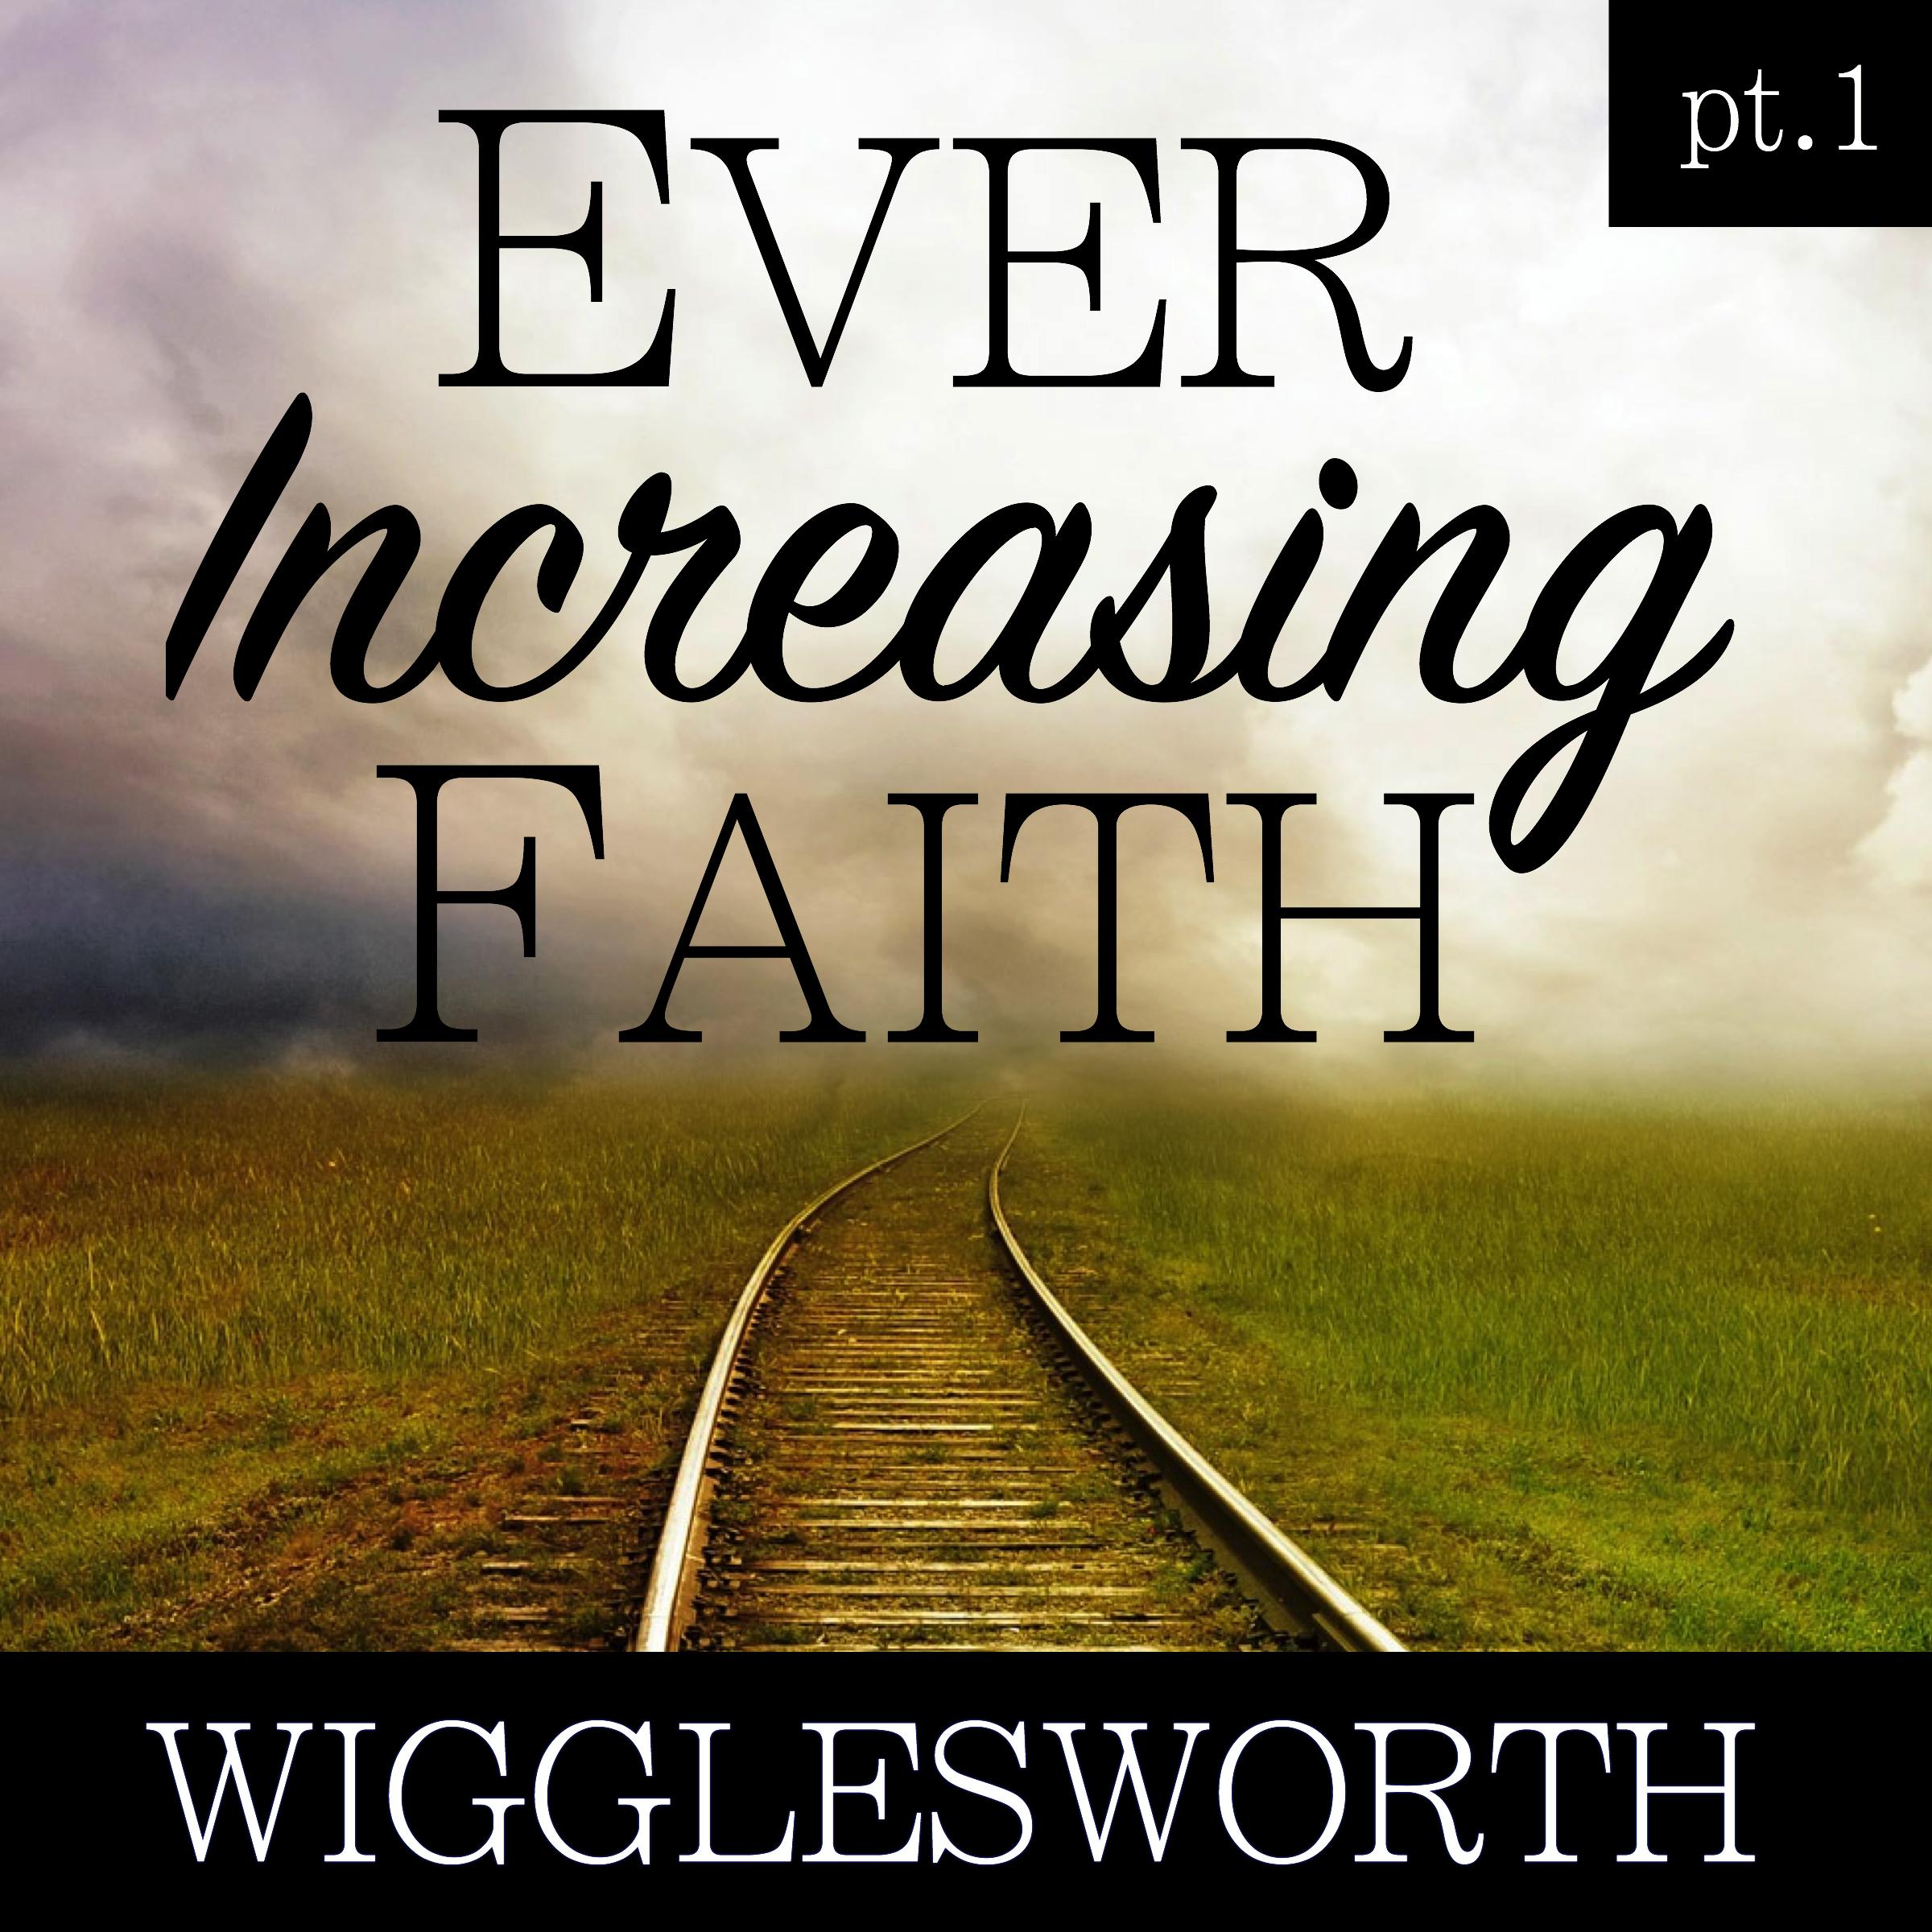 Audiobook Cover (Ever Increasing faith pt 1).jpg